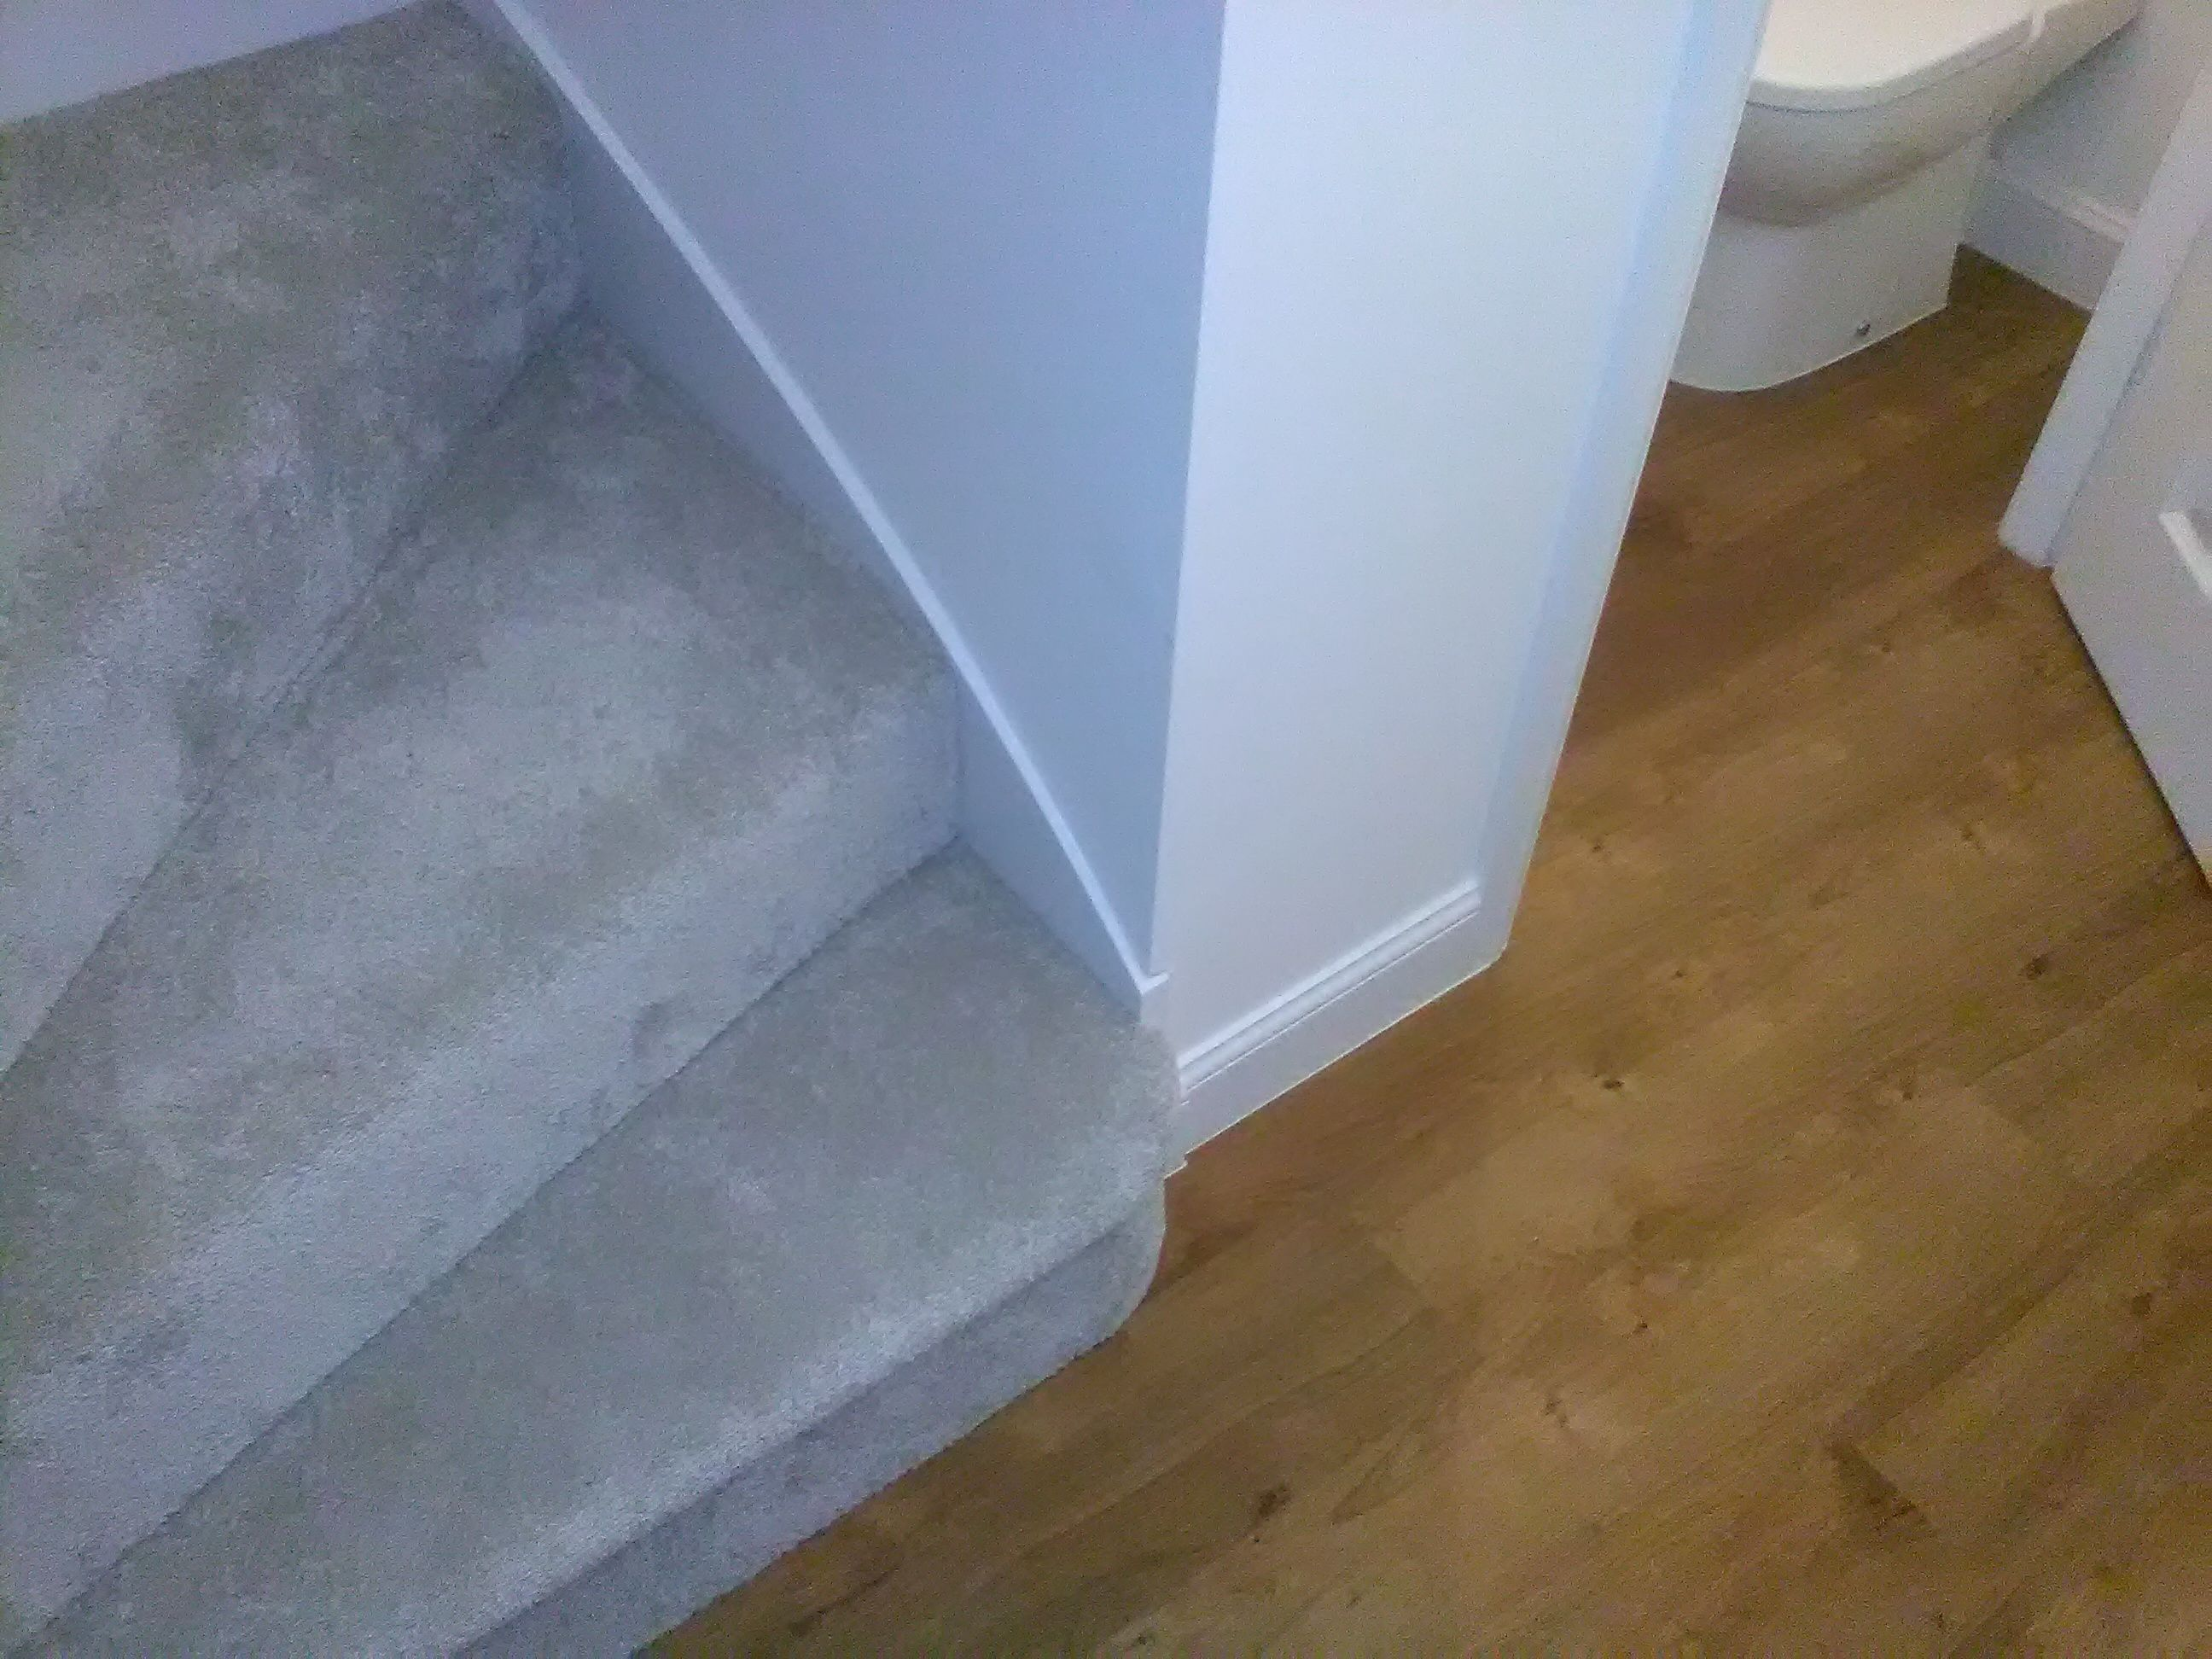 Pin by Perfecto Flooring Ltd on Amtico Spacia \'Royal Oak\' & \'Crema ...